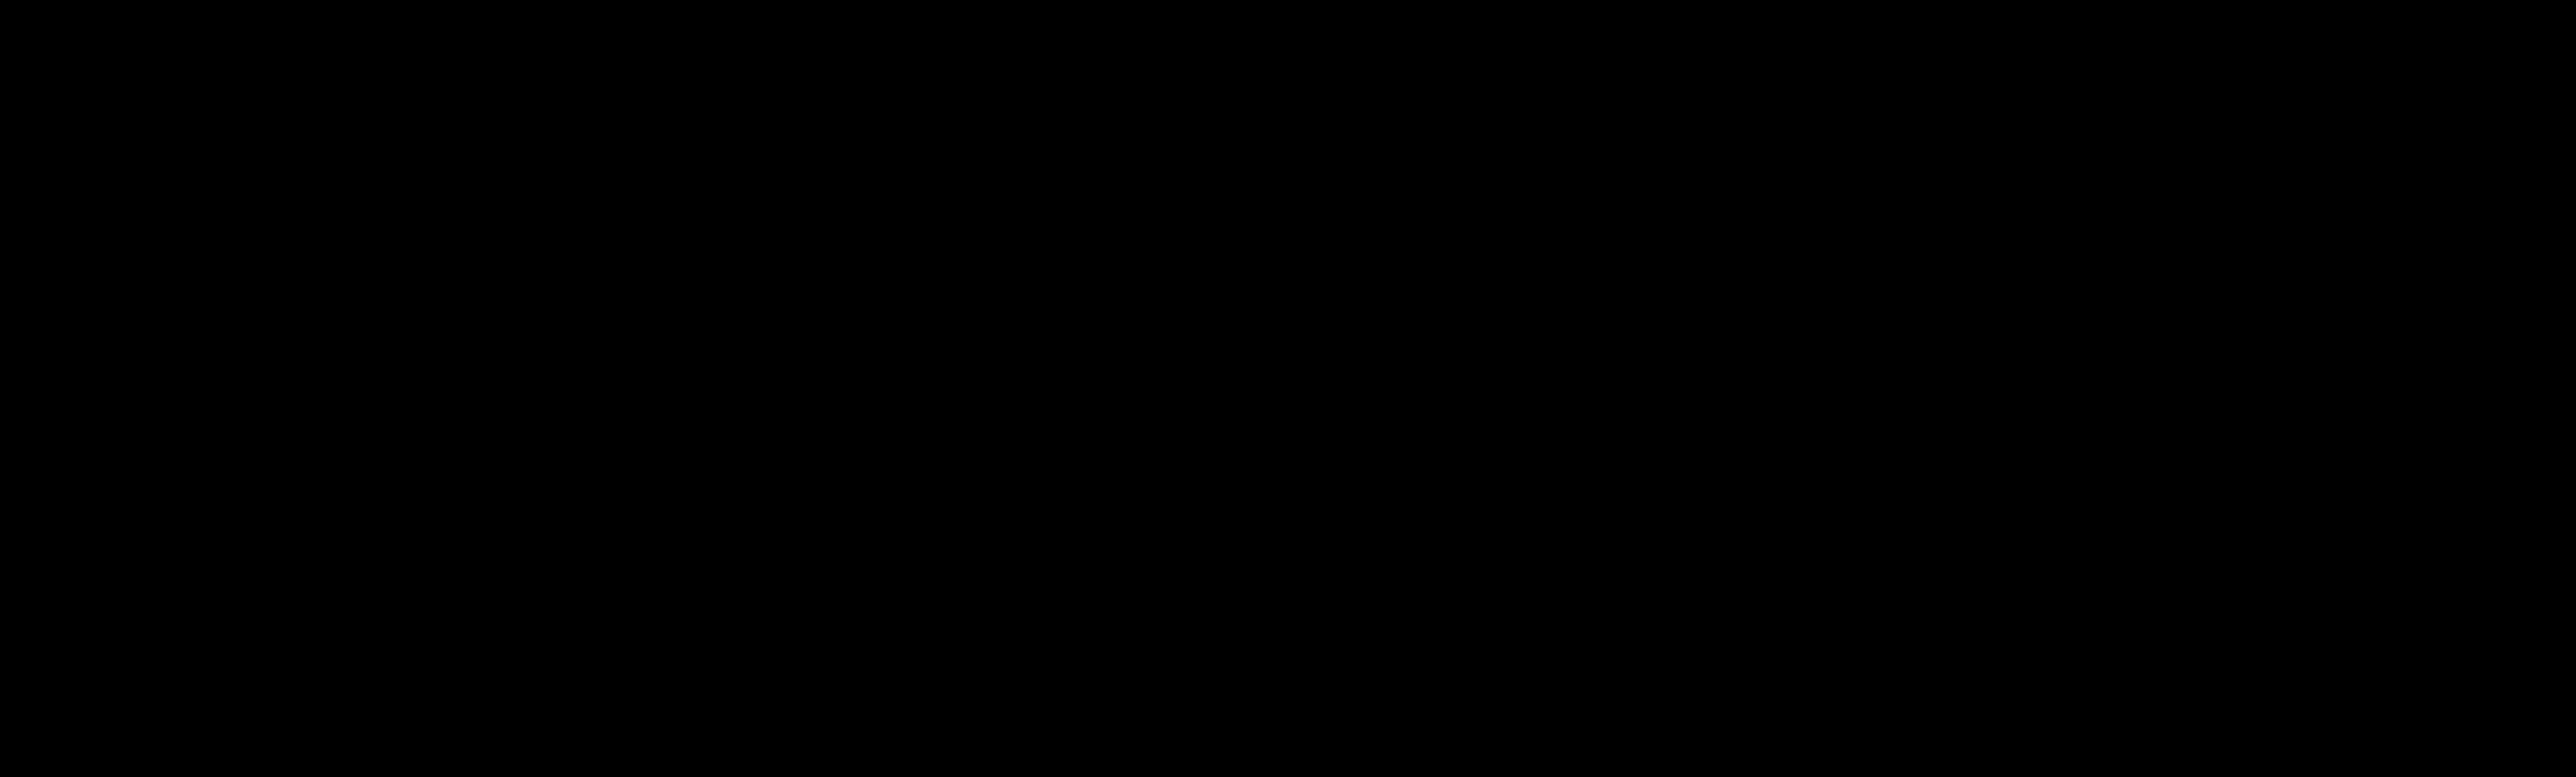 regelmaessigerreeport